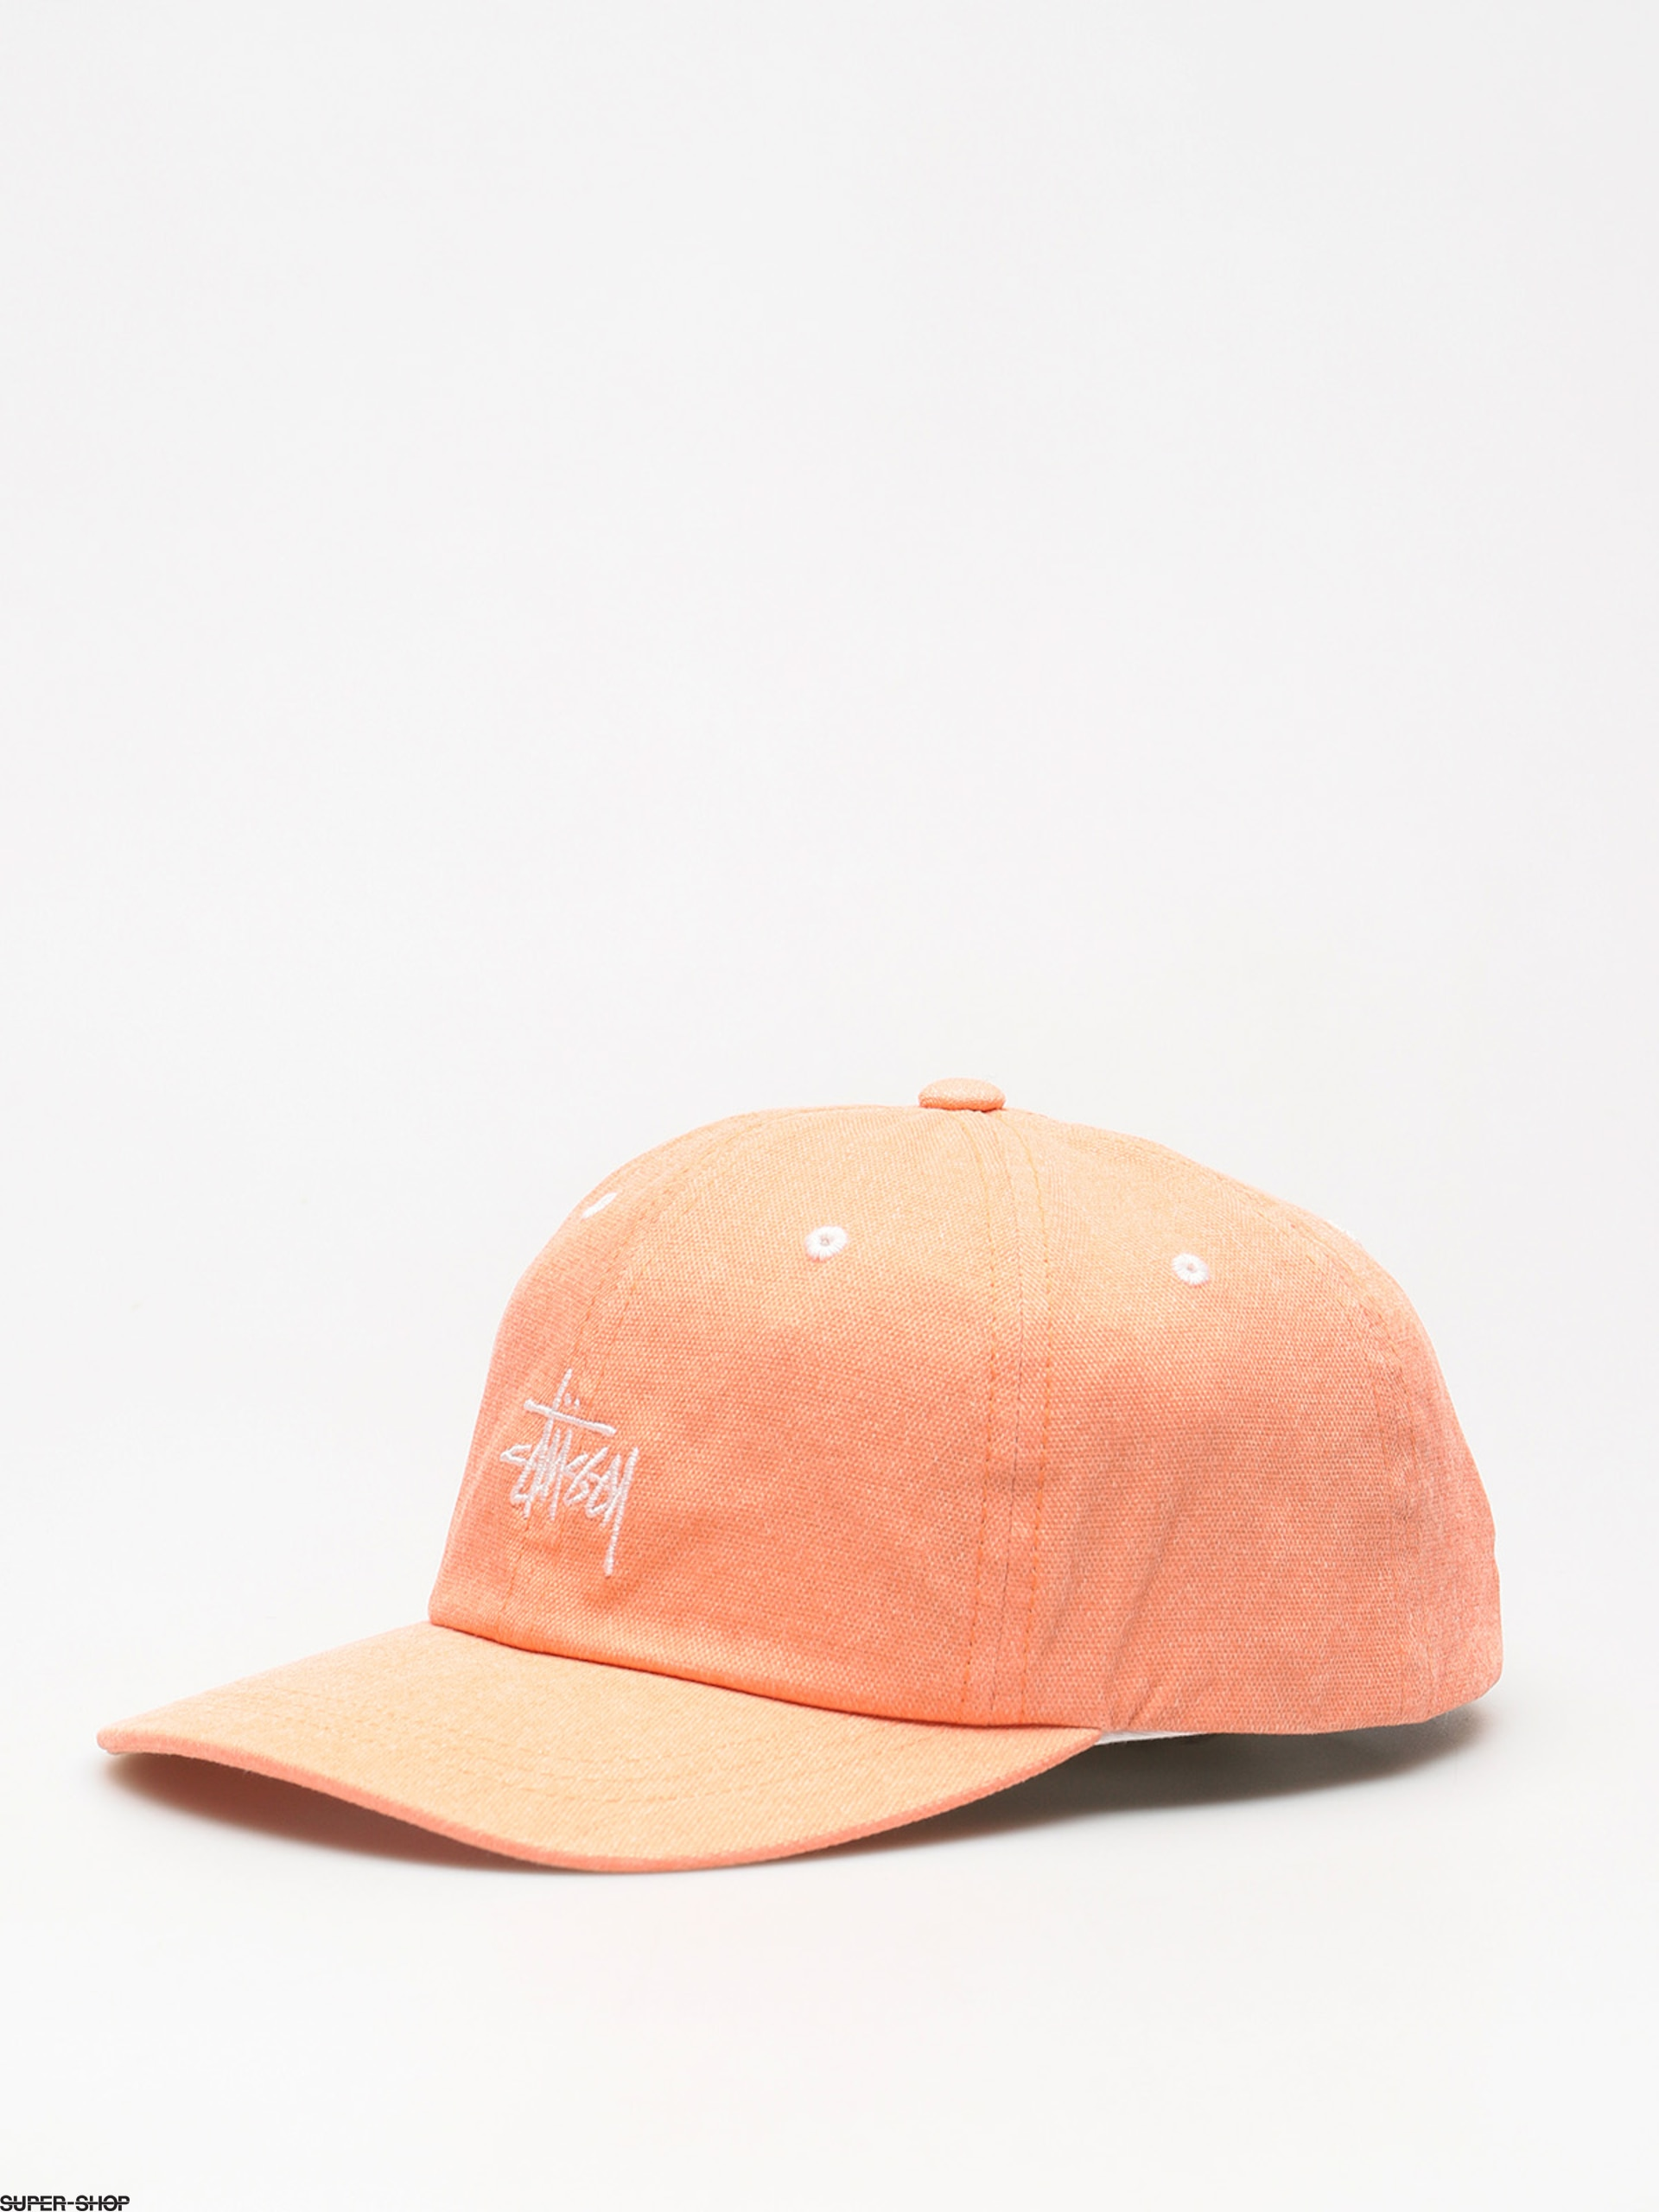 0151643c07a 923386-w1920-stussy-cap-washed-stock-low-pro-zd-orange.jpg